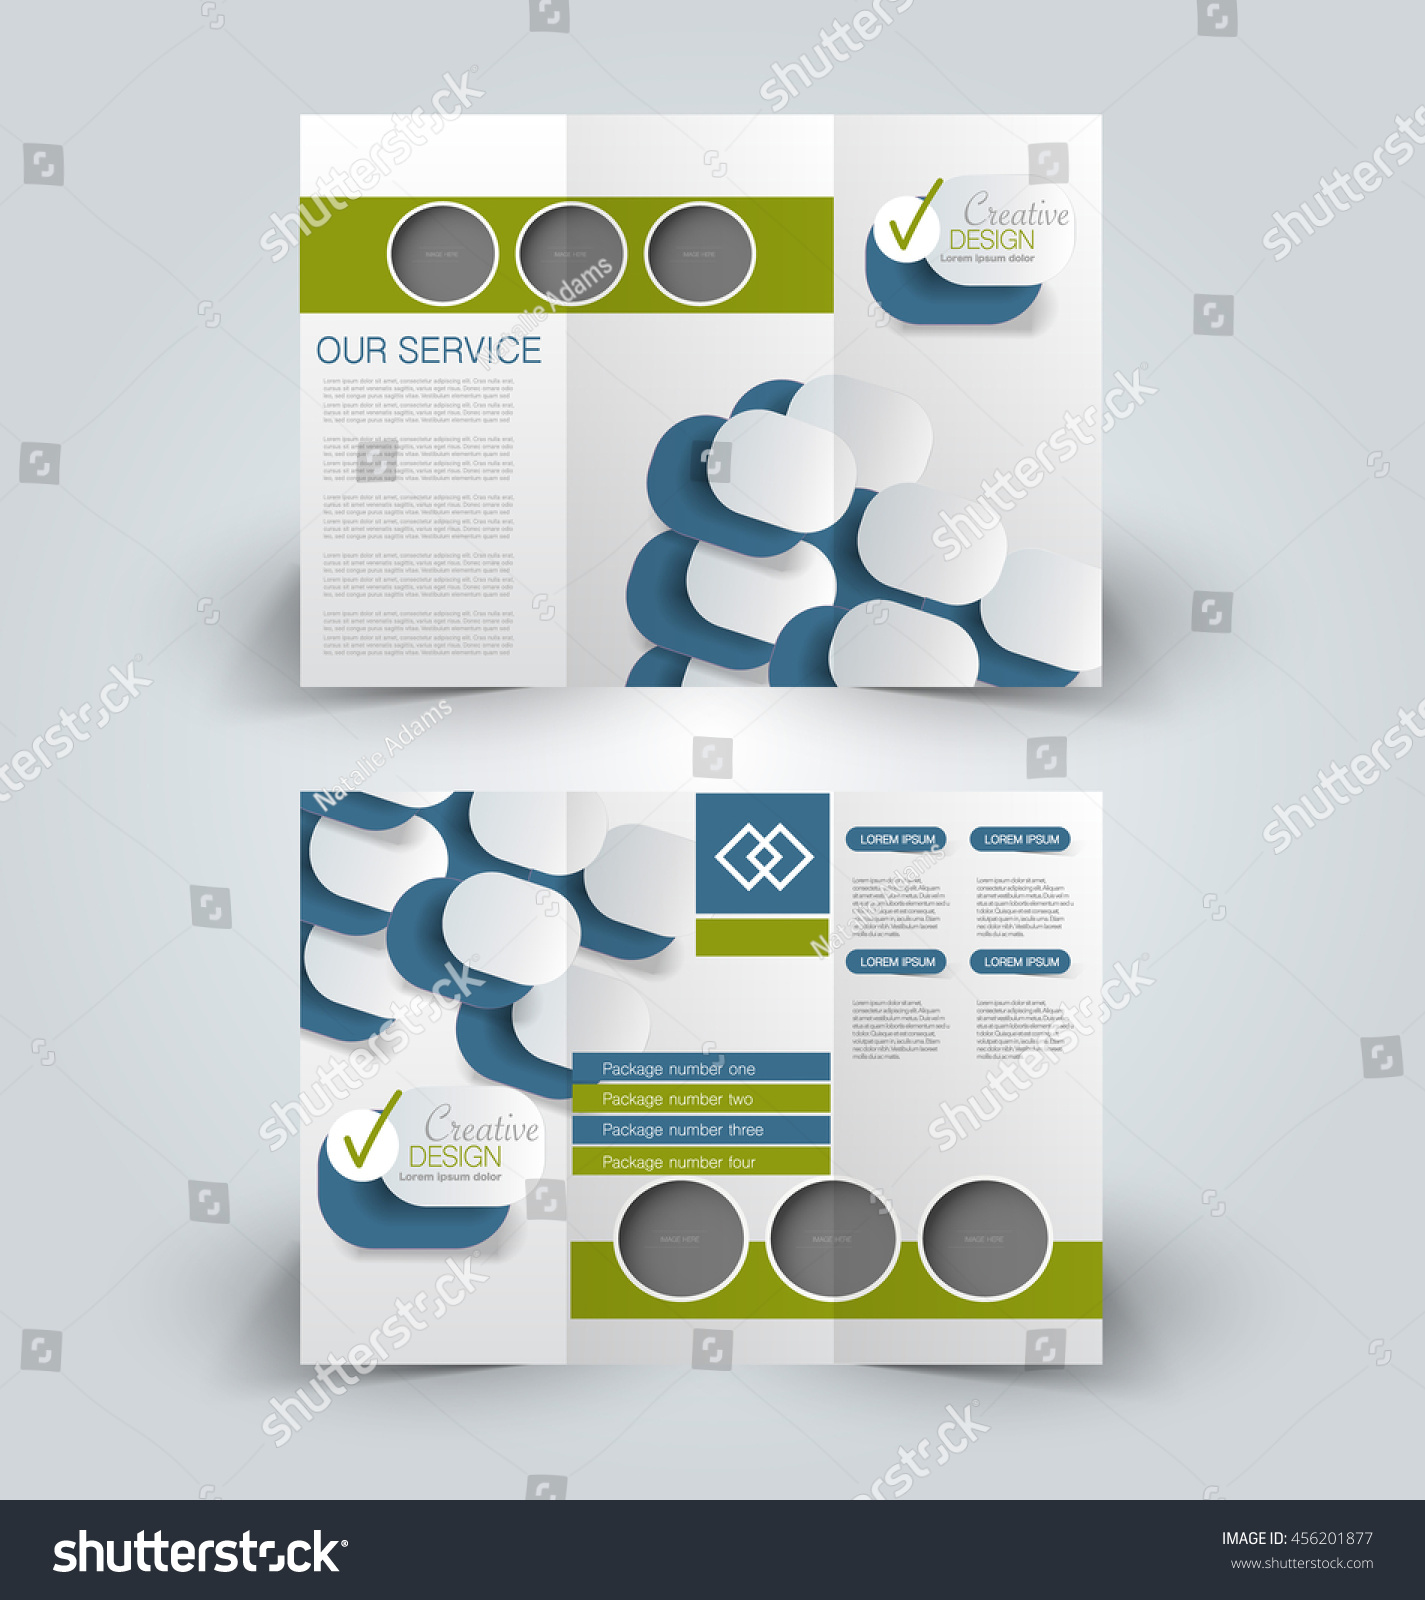 brochure design templates for education - brochure mock design template business education stock